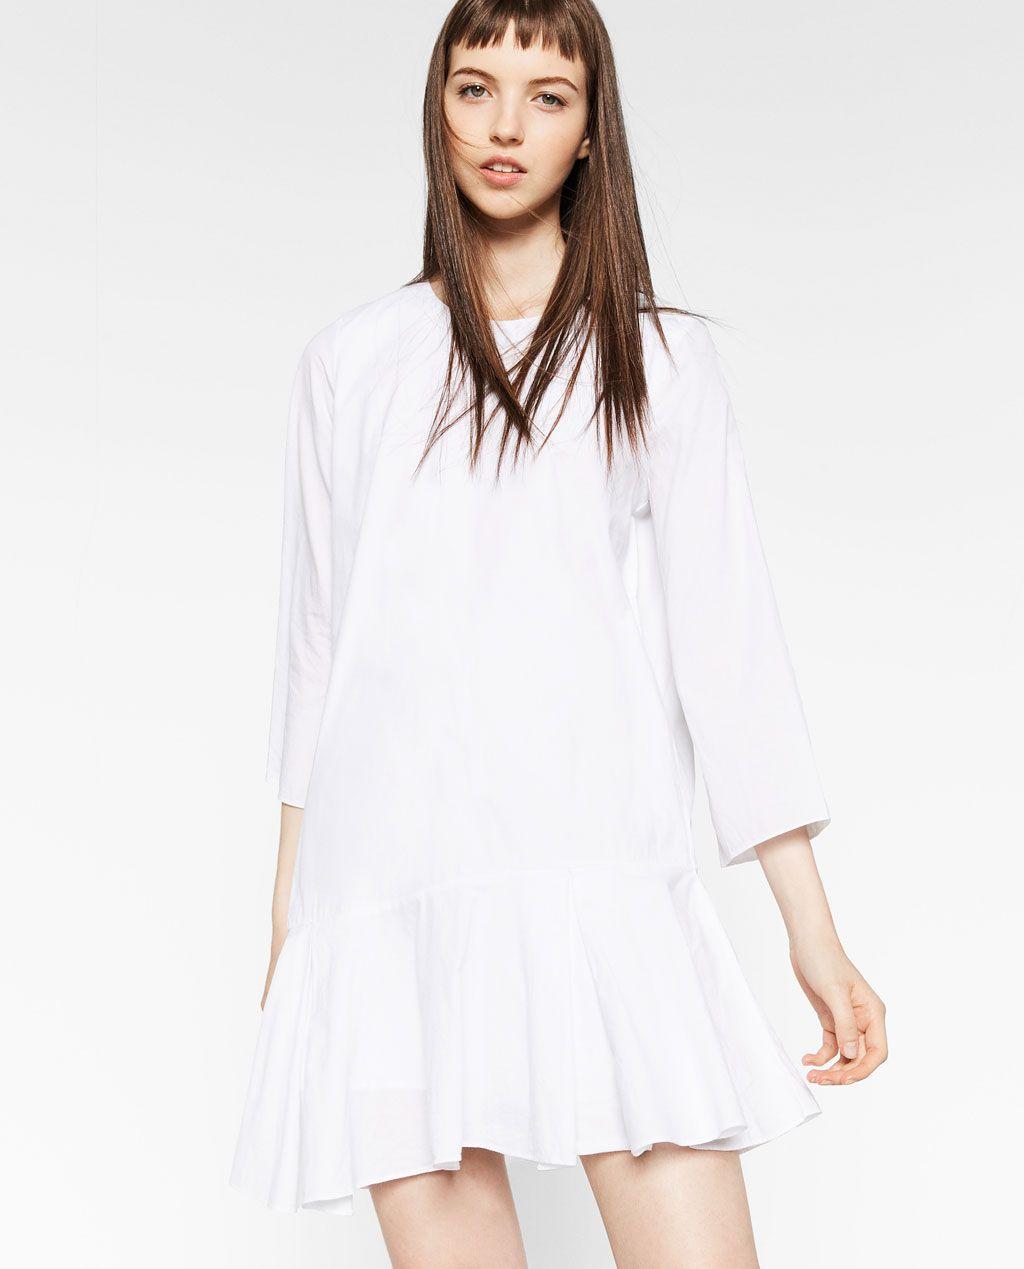 e89f8a05 Image 1 of ASYMMETRIC STRIPED DRESS from Zara | Dress | Dresses ...